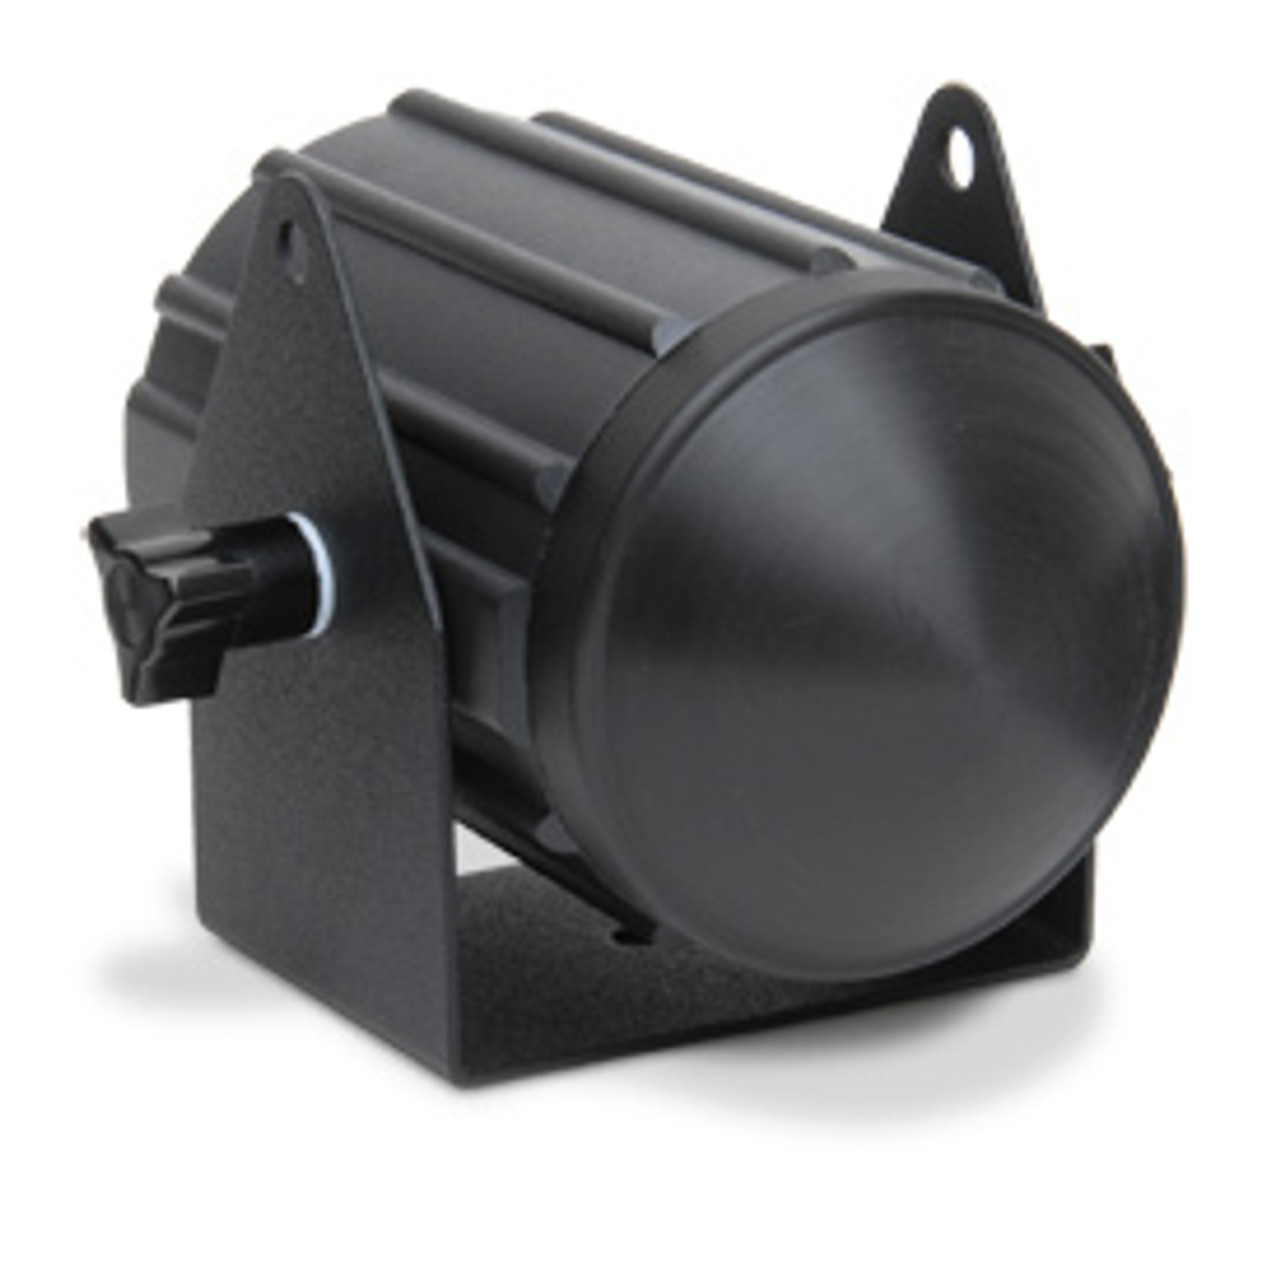 Stalker Patrol Law Enforcement Radar Gun, 1 Antennae